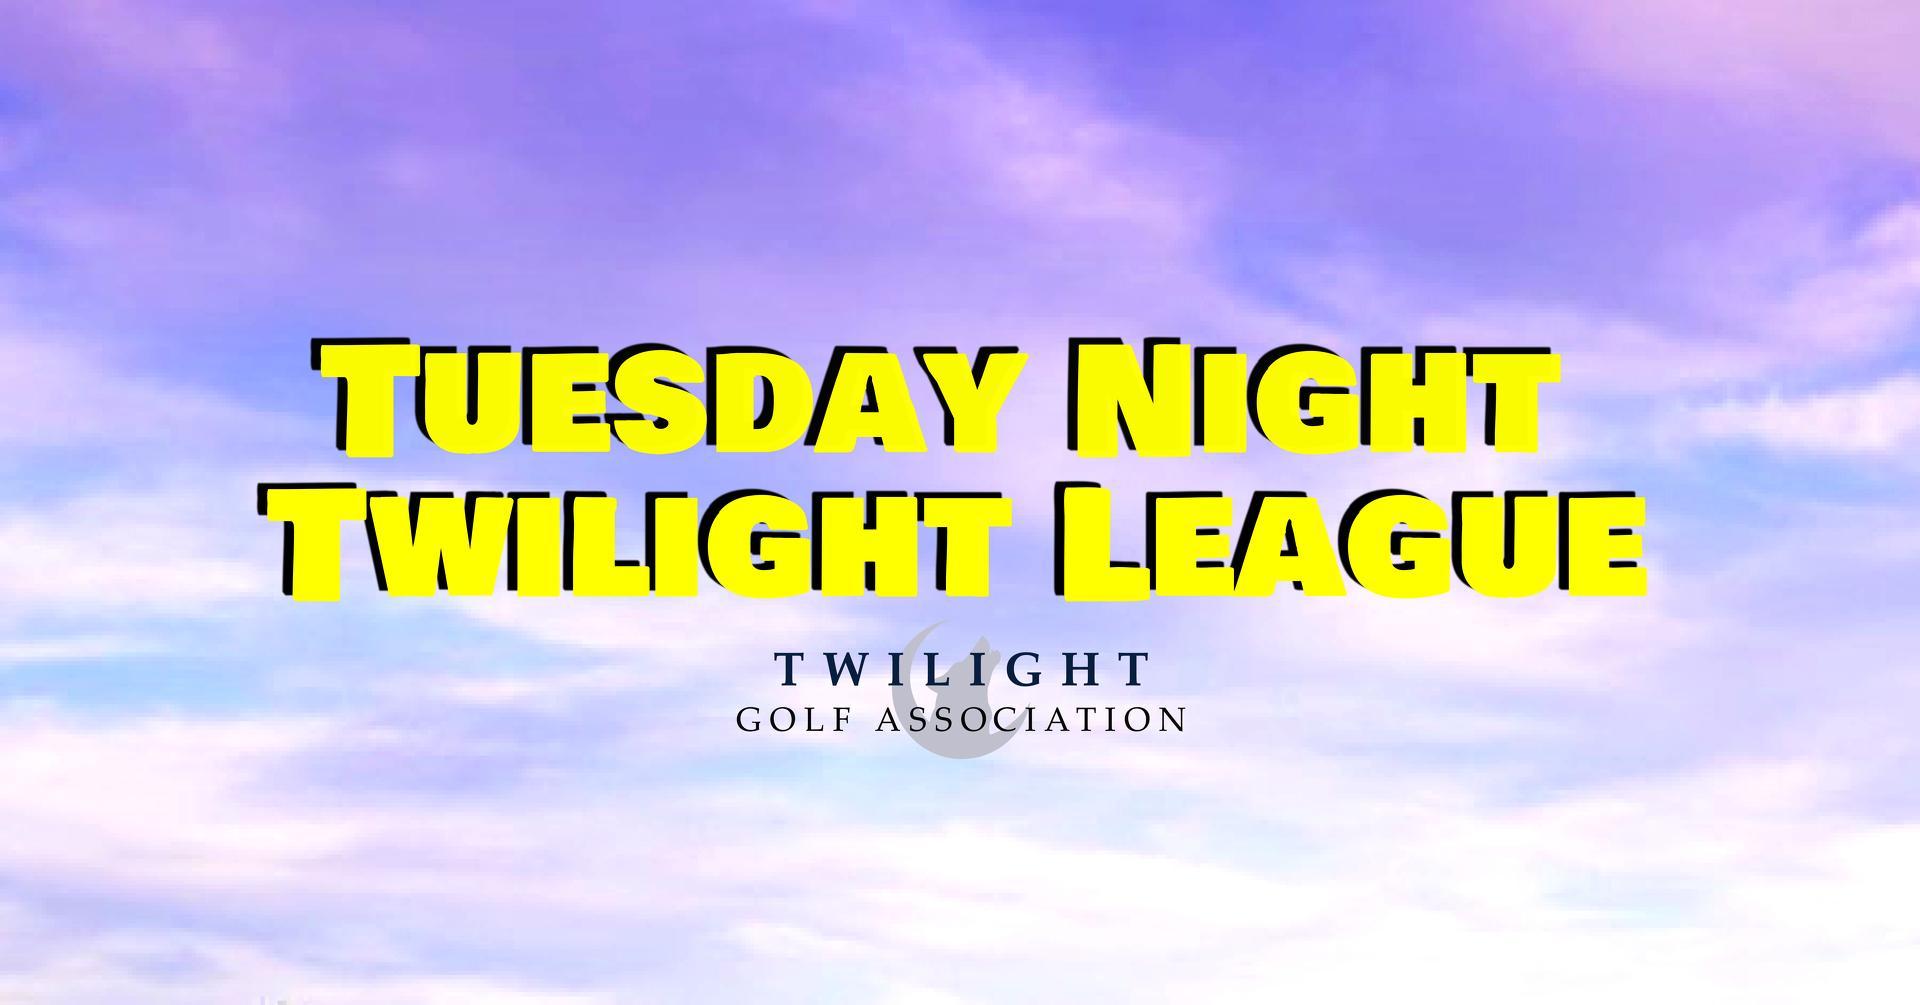 Tuesday Twilight League at Riverchase Golf Club